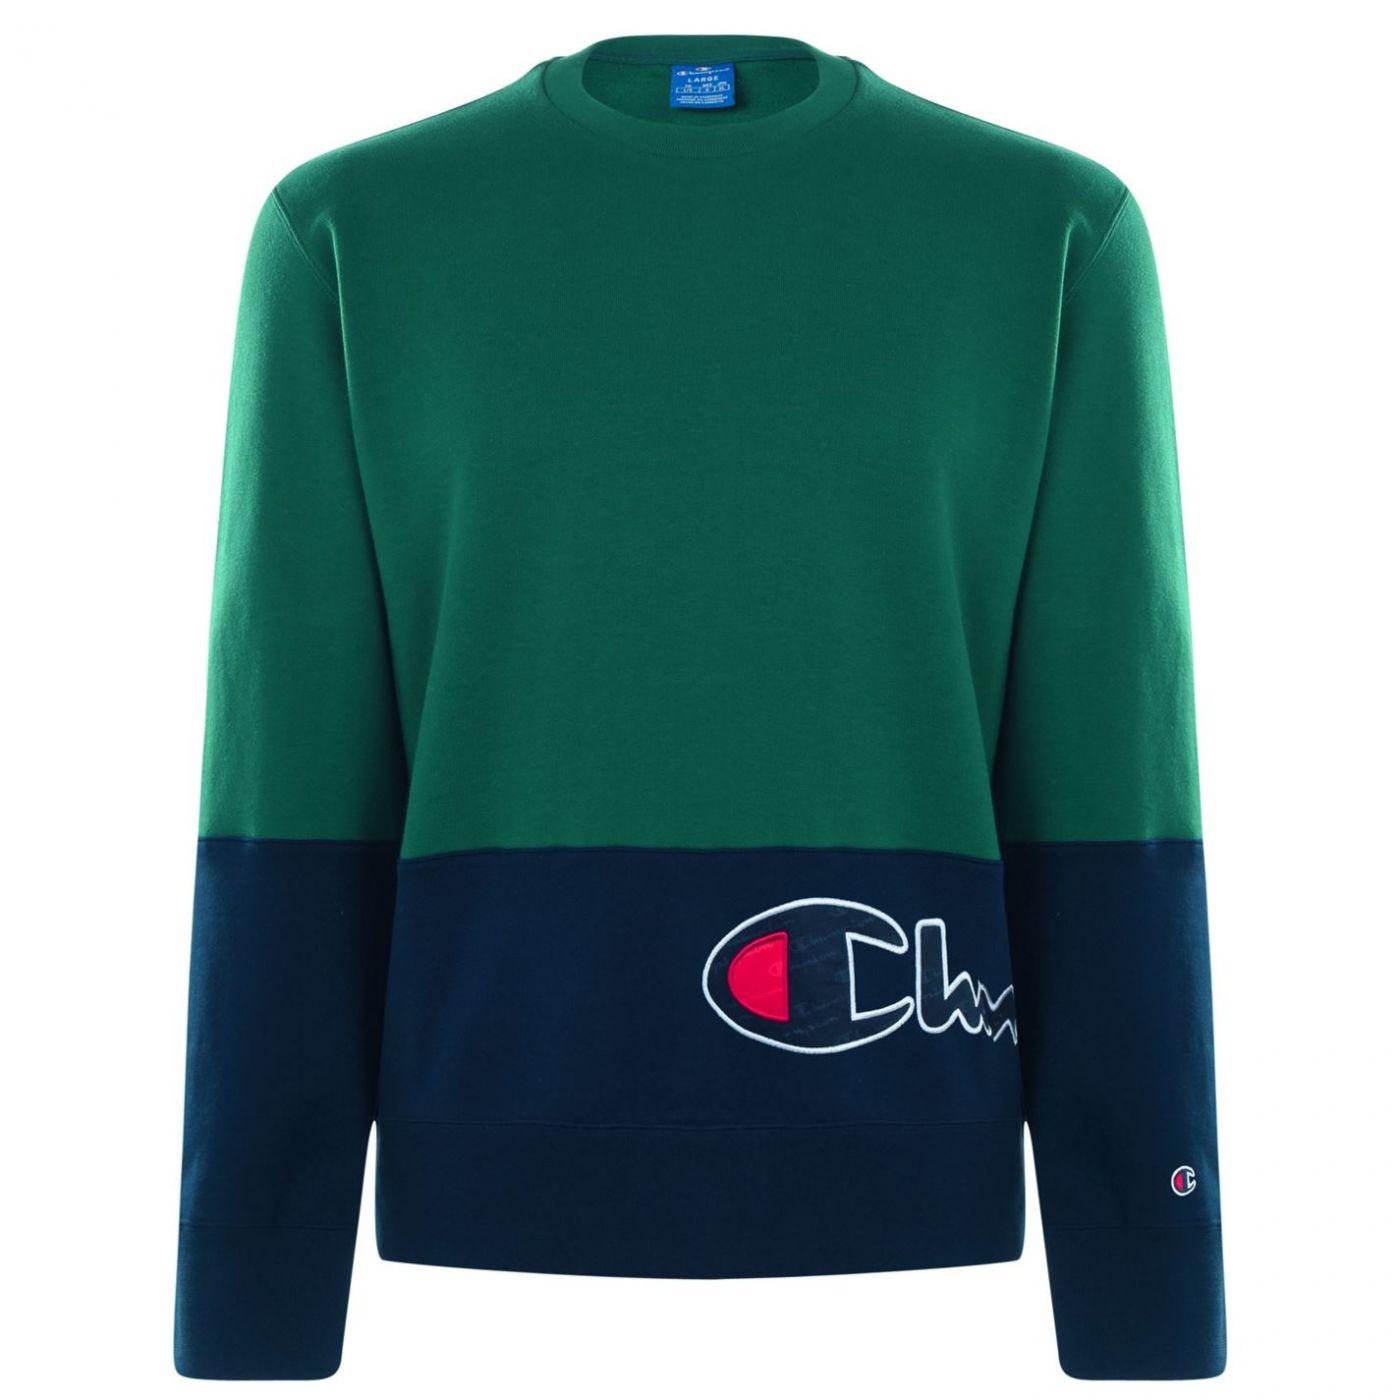 Champion Cut and Sew Sweatshirt